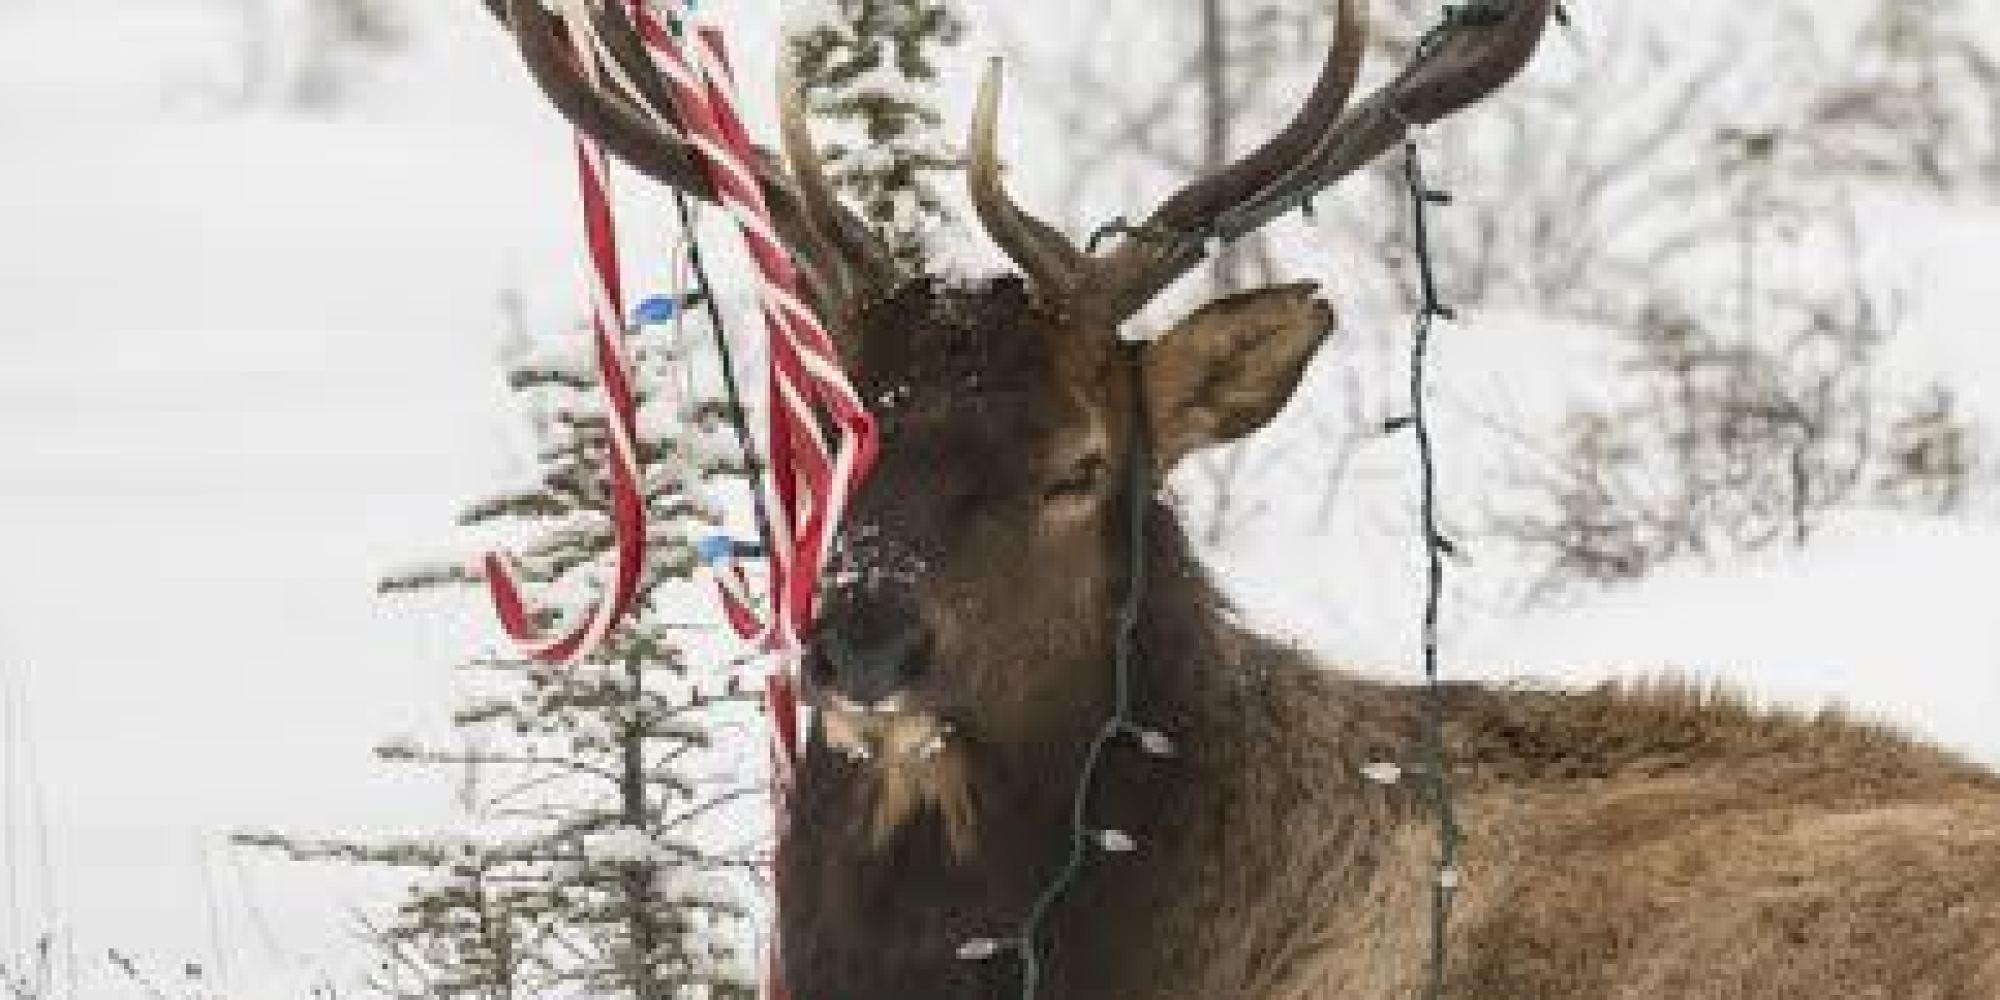 Elk Rescued After Christmas Lights Candy Canes Get Stuck